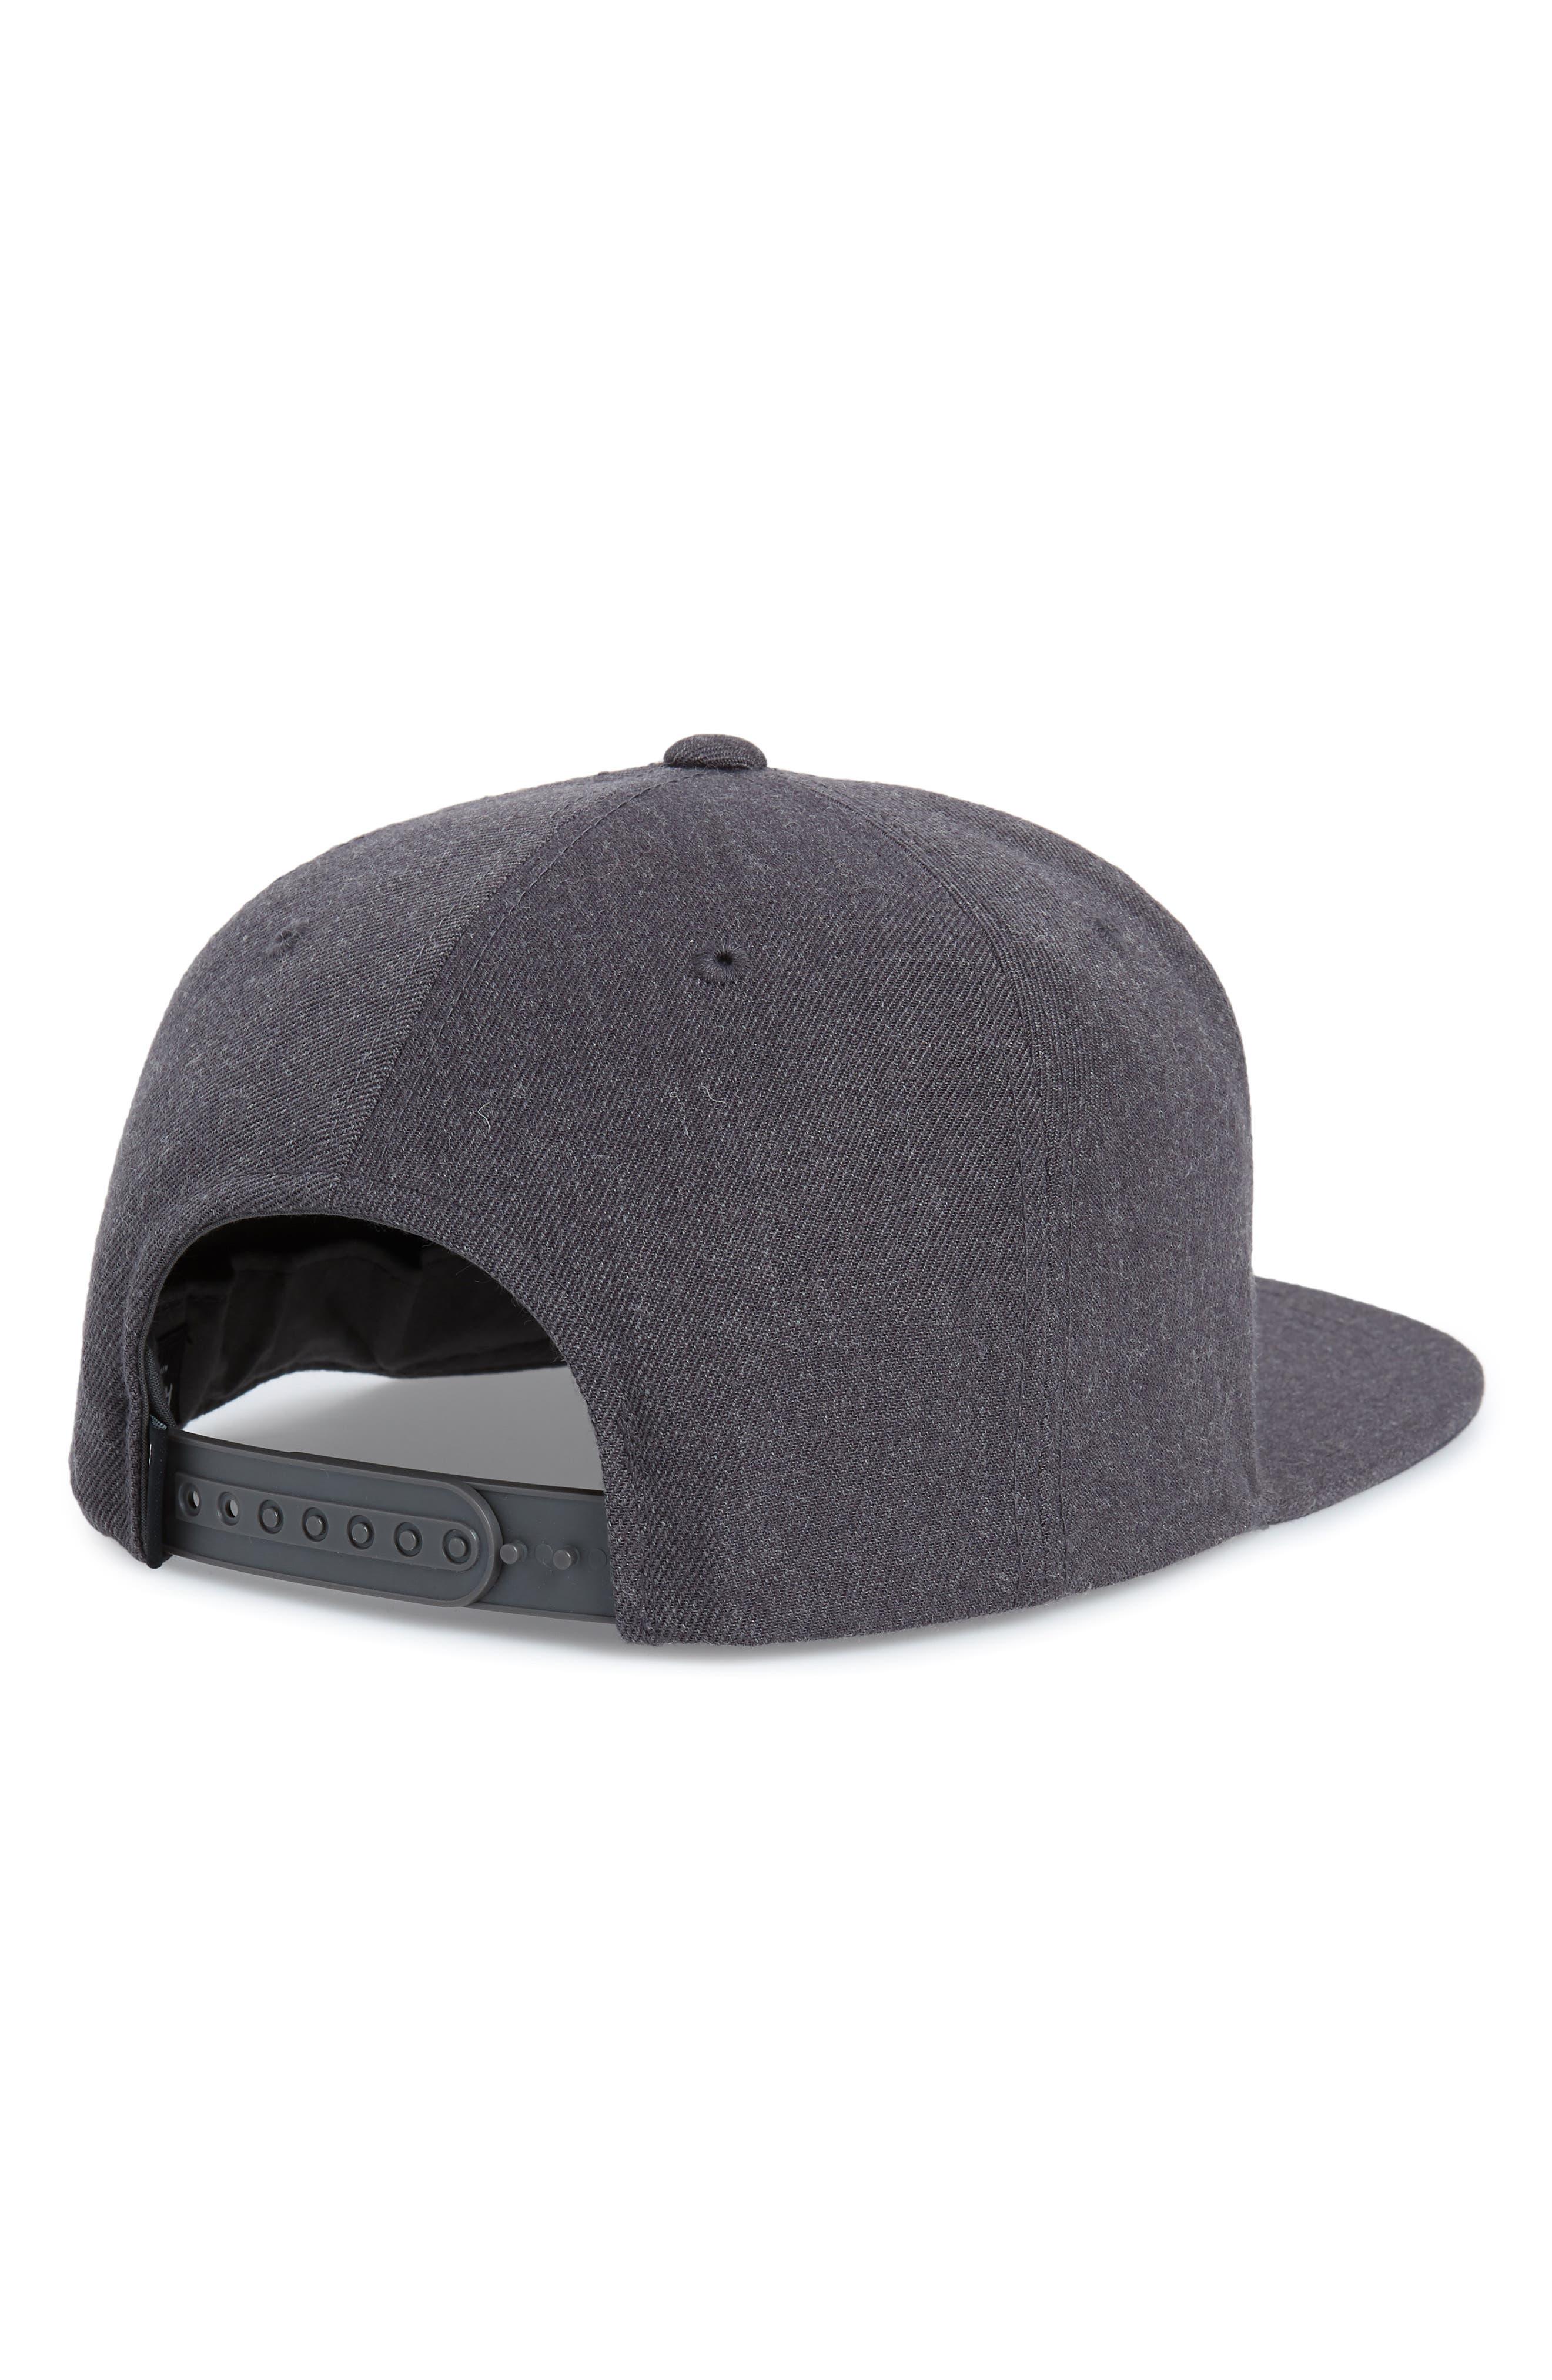 RVCA, 'VA' Snapback Hat, Alternate thumbnail 2, color, DARK CHARCOAL HEATHER